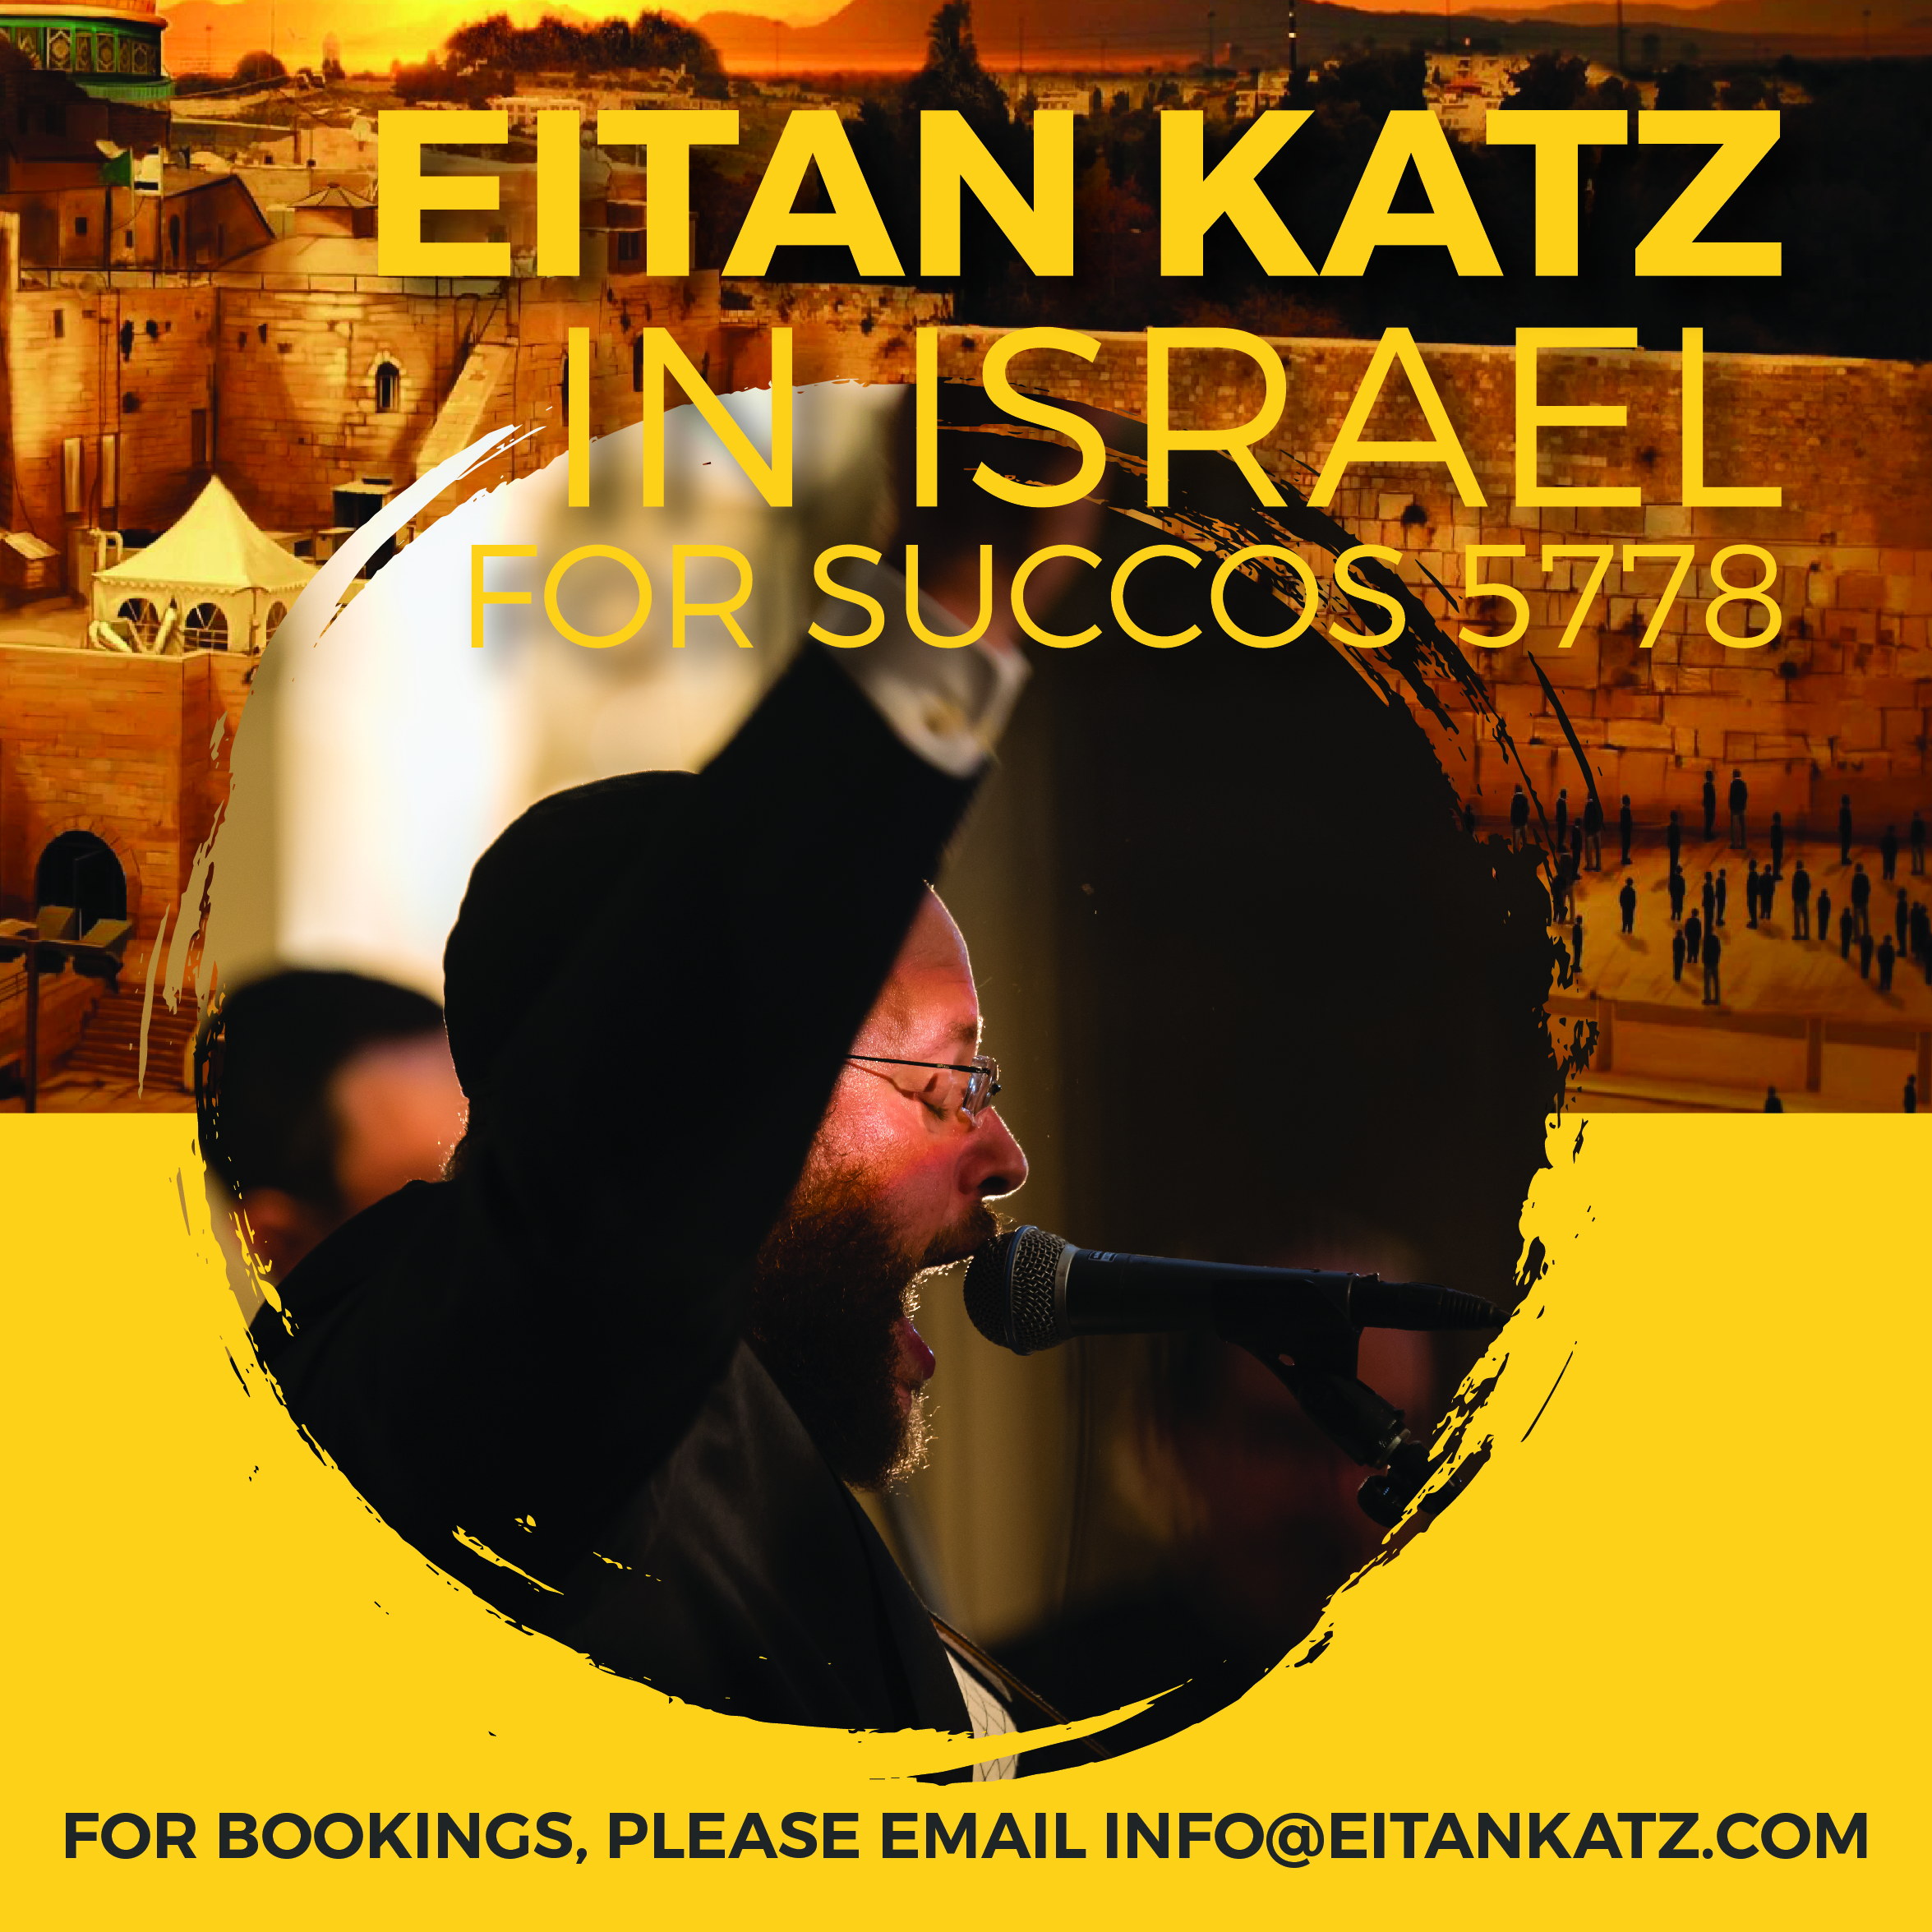 Eitan Katz In Israel - Social Media Post, Eitan Katz